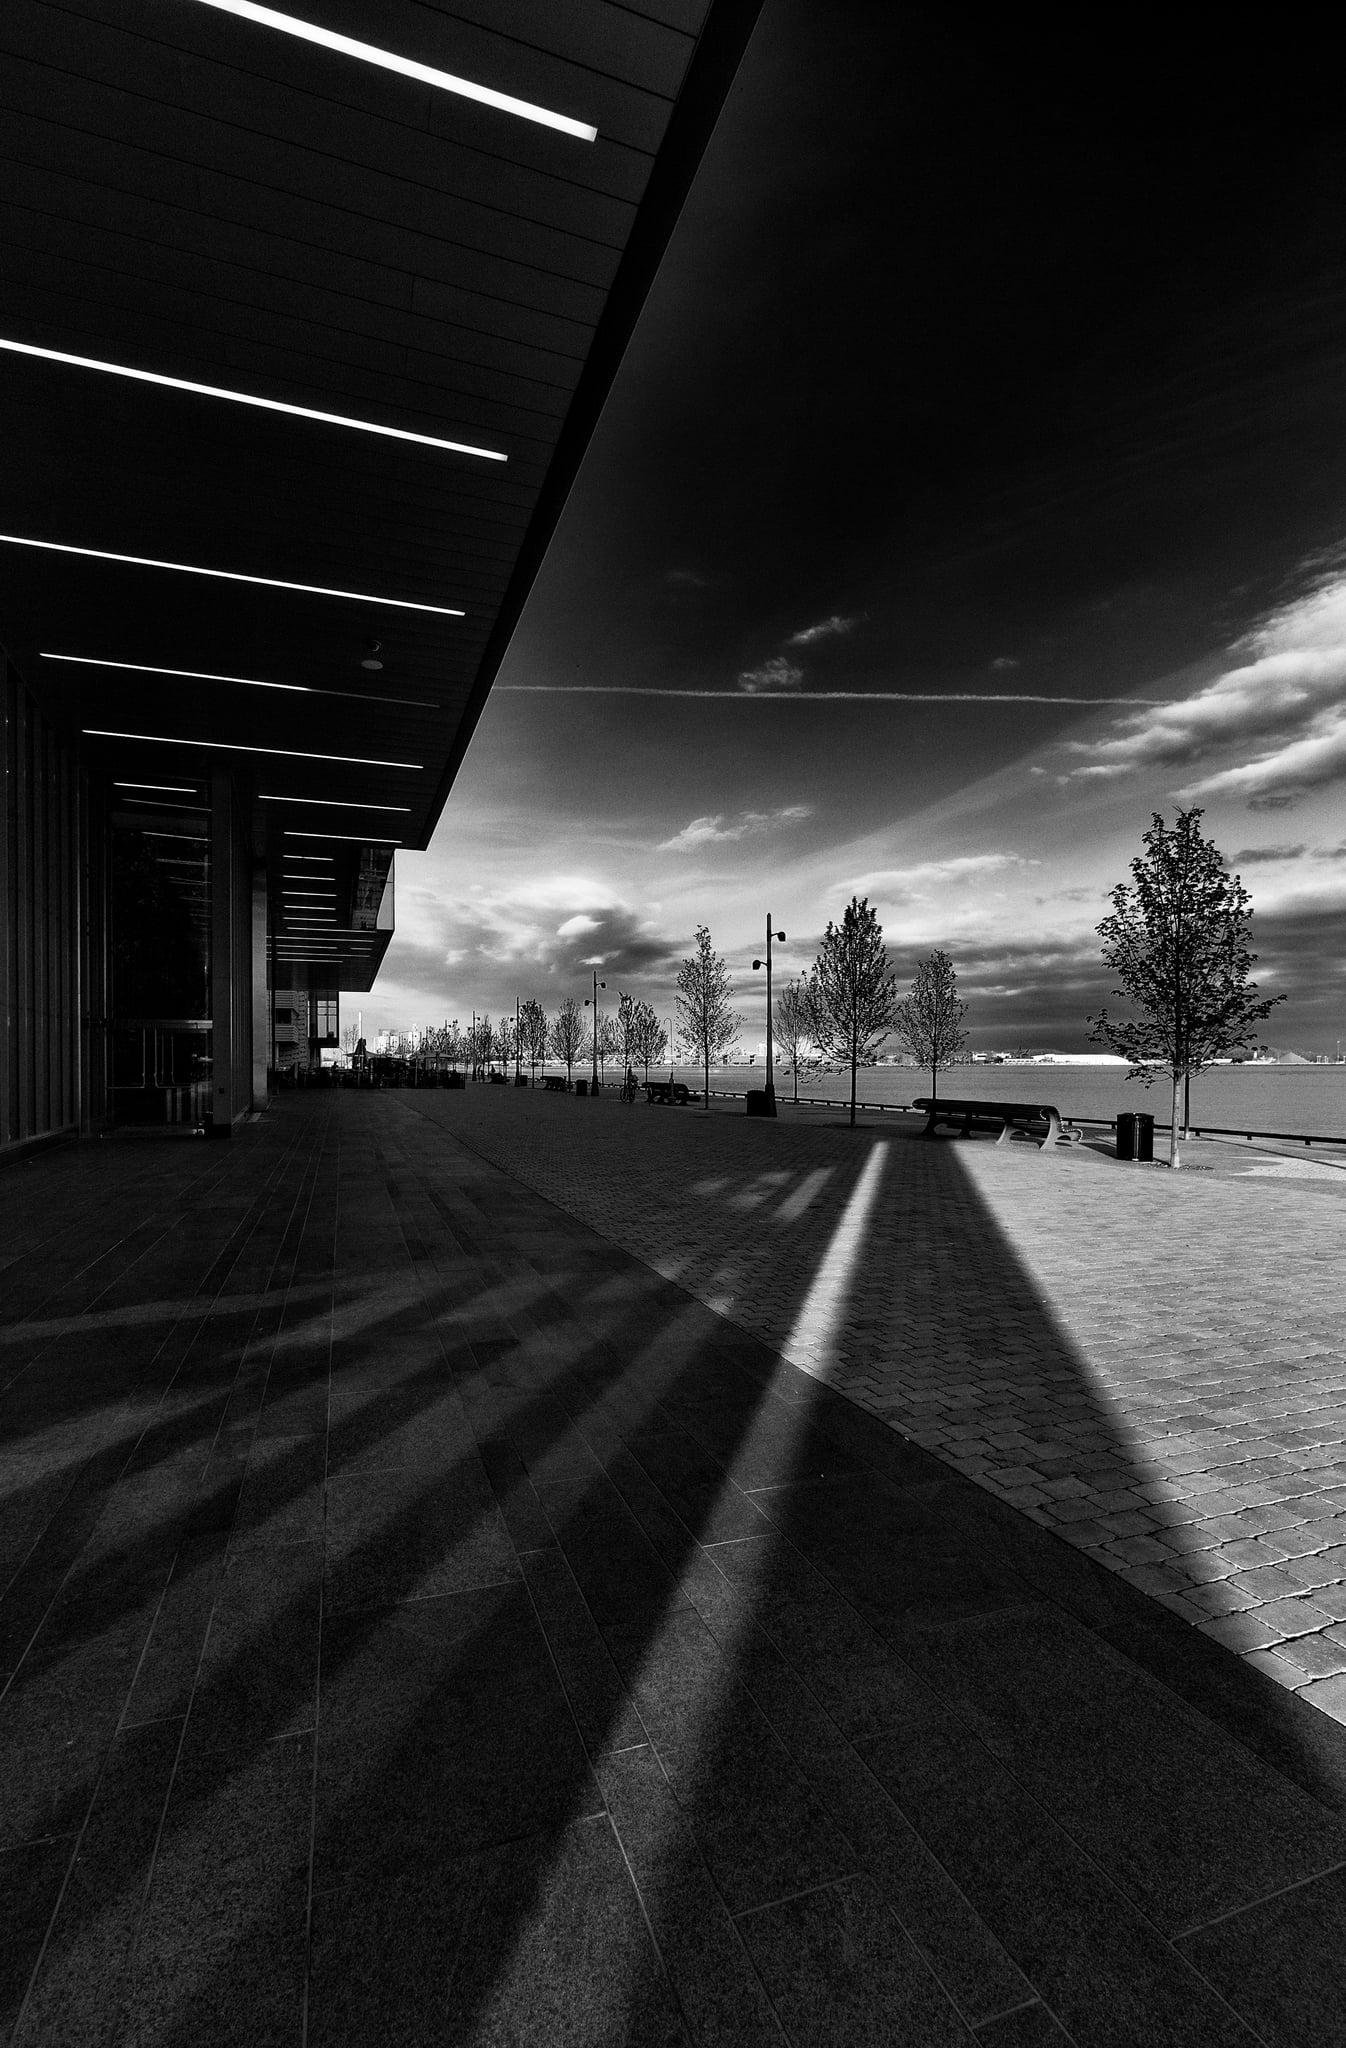 sugar-beach_corus_sidewalk_ceiling_shadows_bw_01.jpg